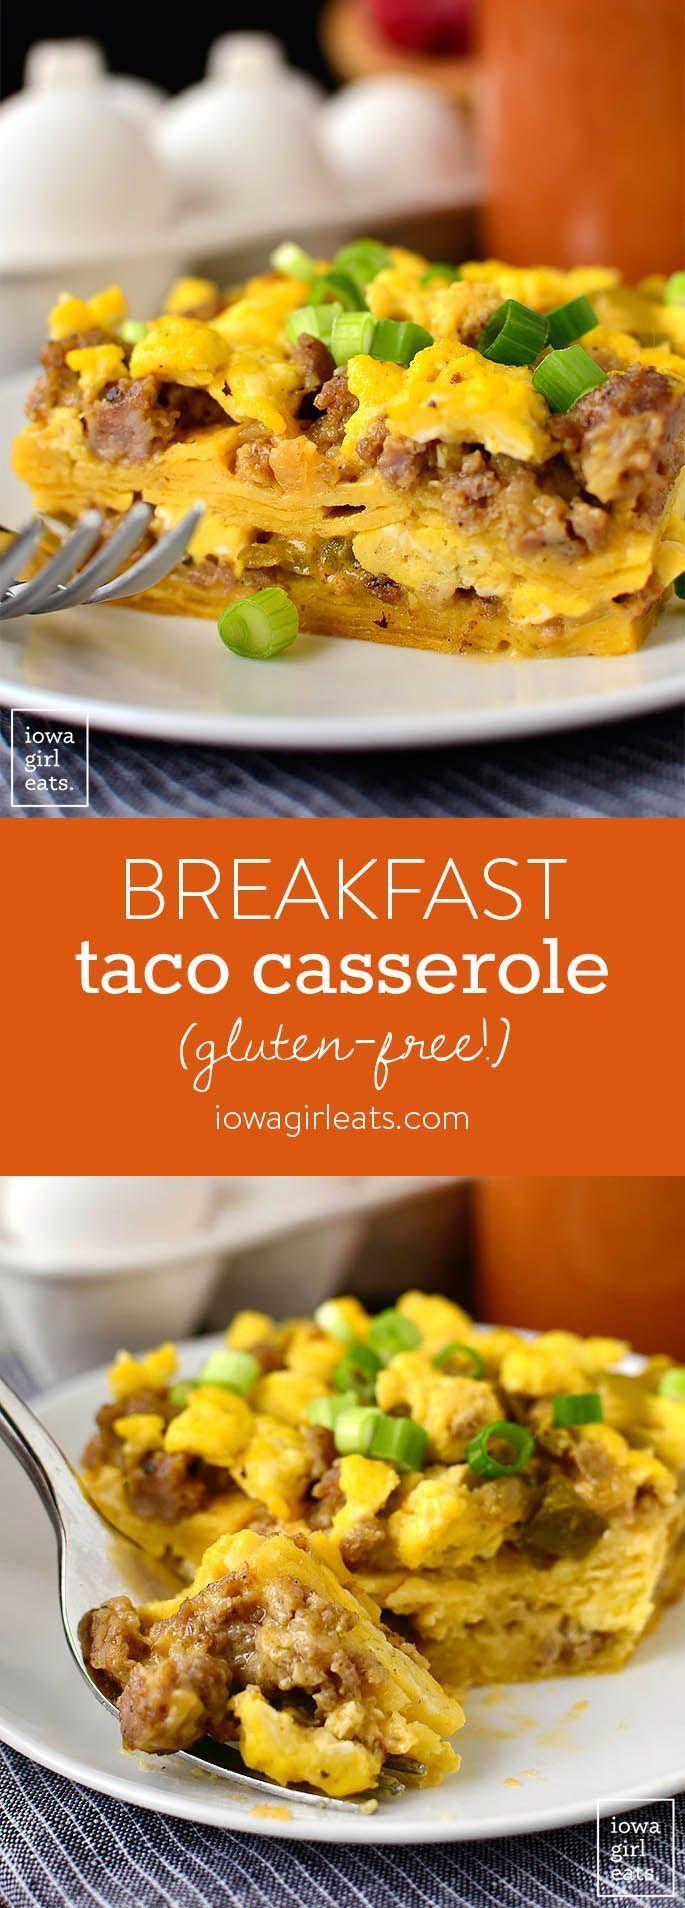 Breakfast Taco Casserole is layers of breakfast taco ingredients baked in an easy-to-eat, satisfying casserole. This gluten-free breakfast recipe reheats wonderfully, too! | iowagirleats.com